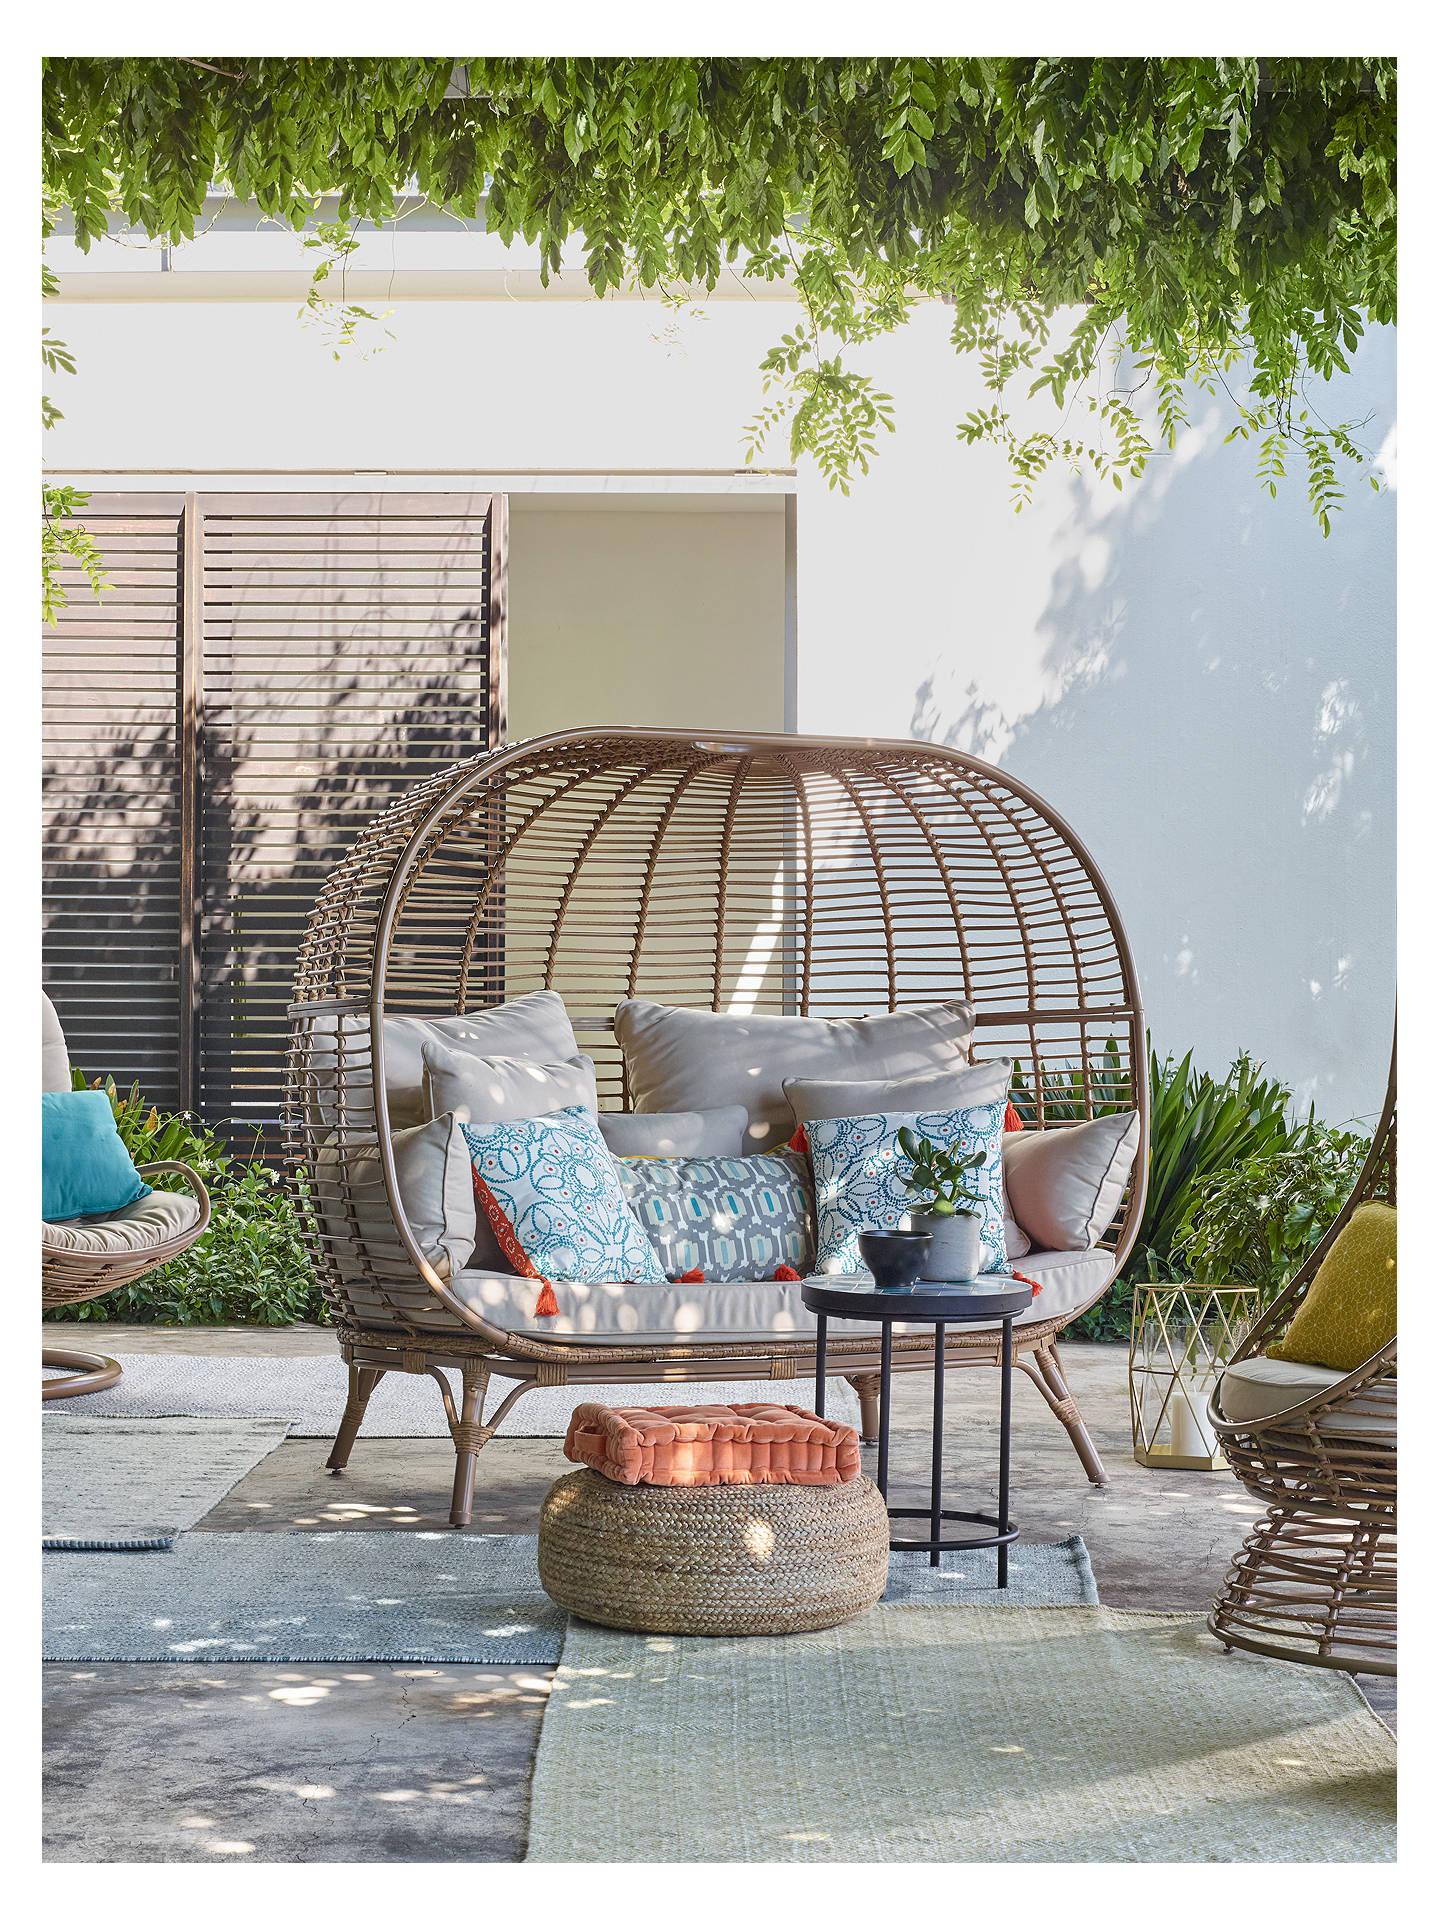 Buy john lewis partners cabana 2 seater garden sofa pod natural online at johnlewis